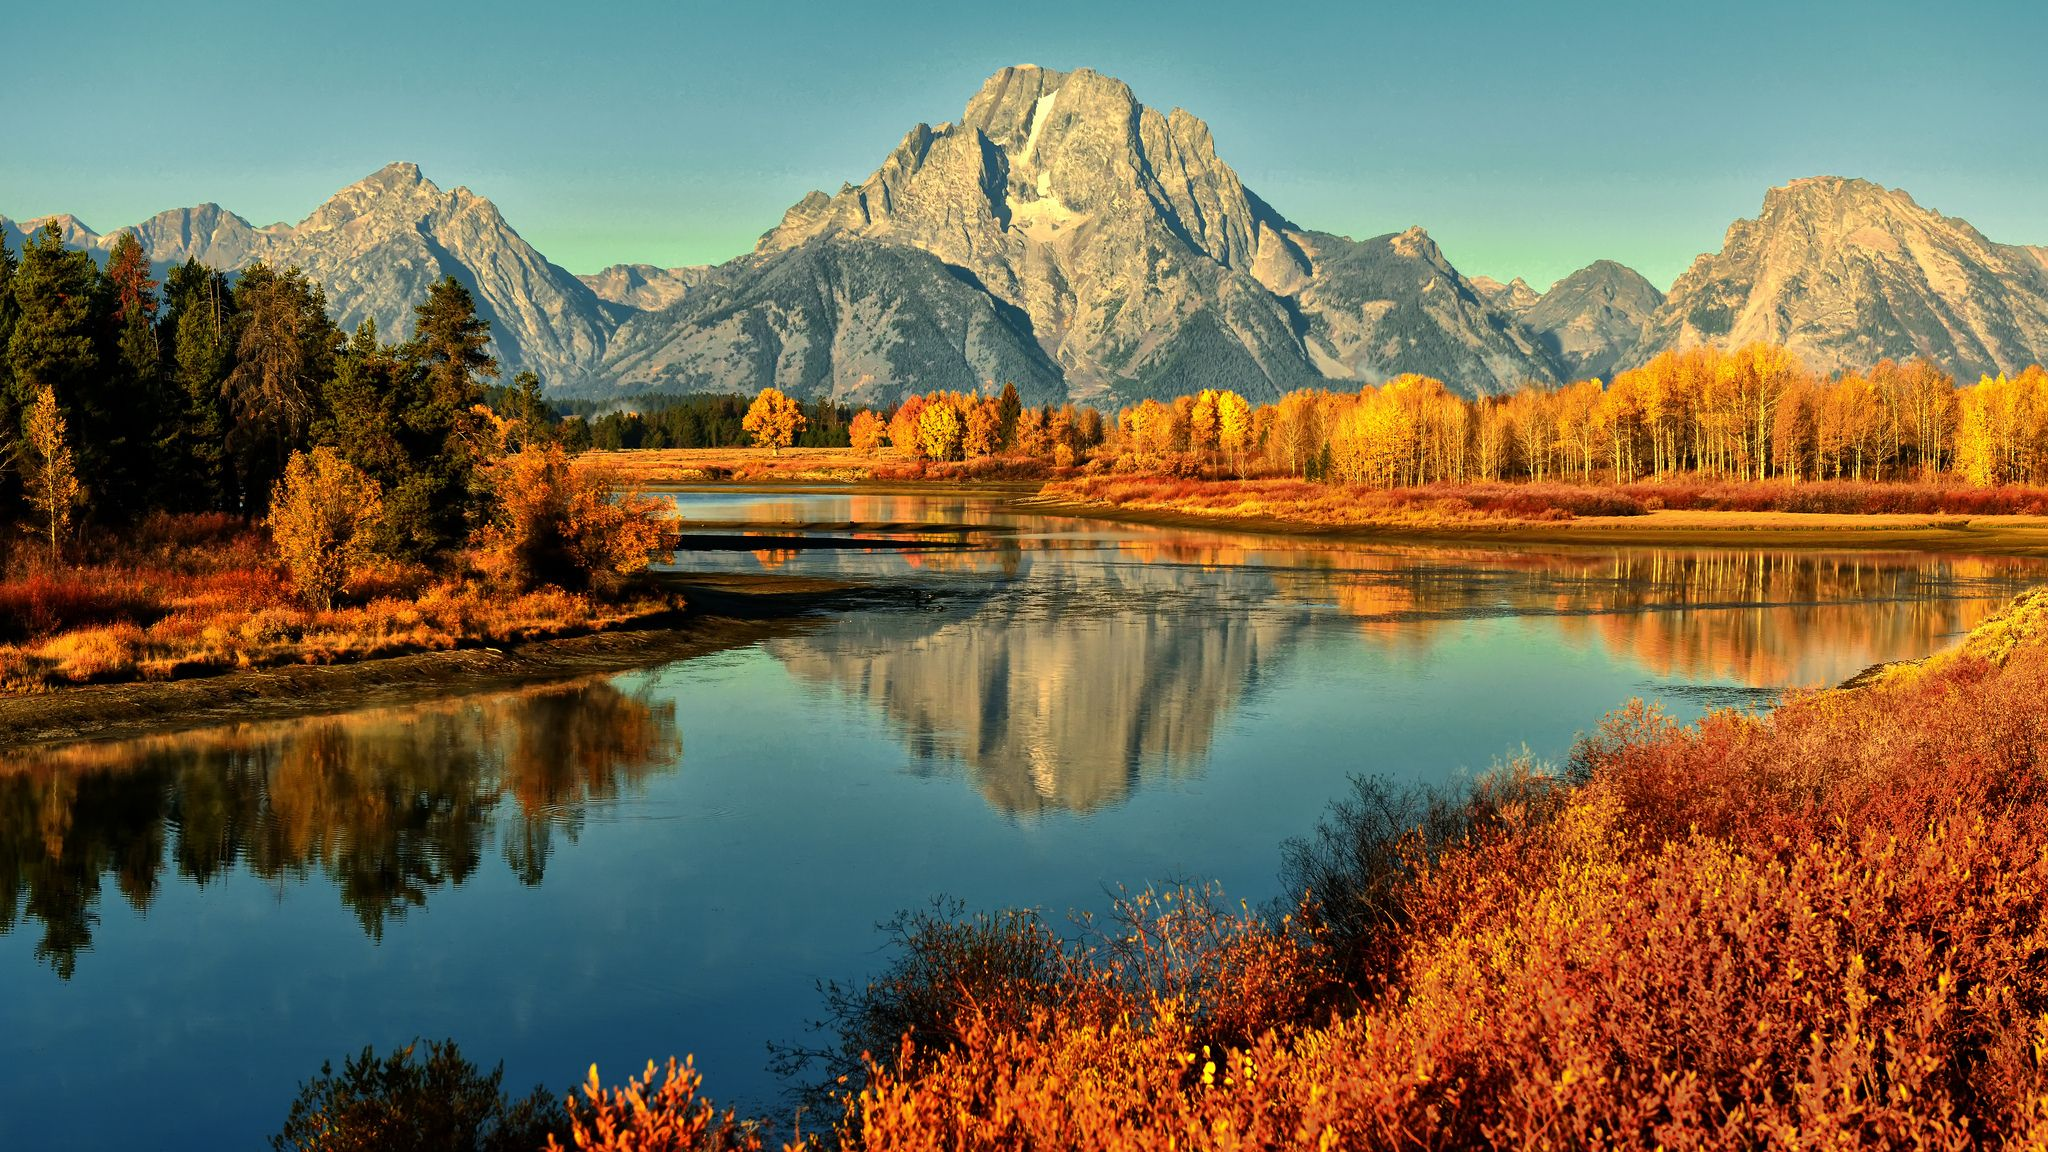 Autumn Mountain River Autumn Nature Desktop Wallpapers And